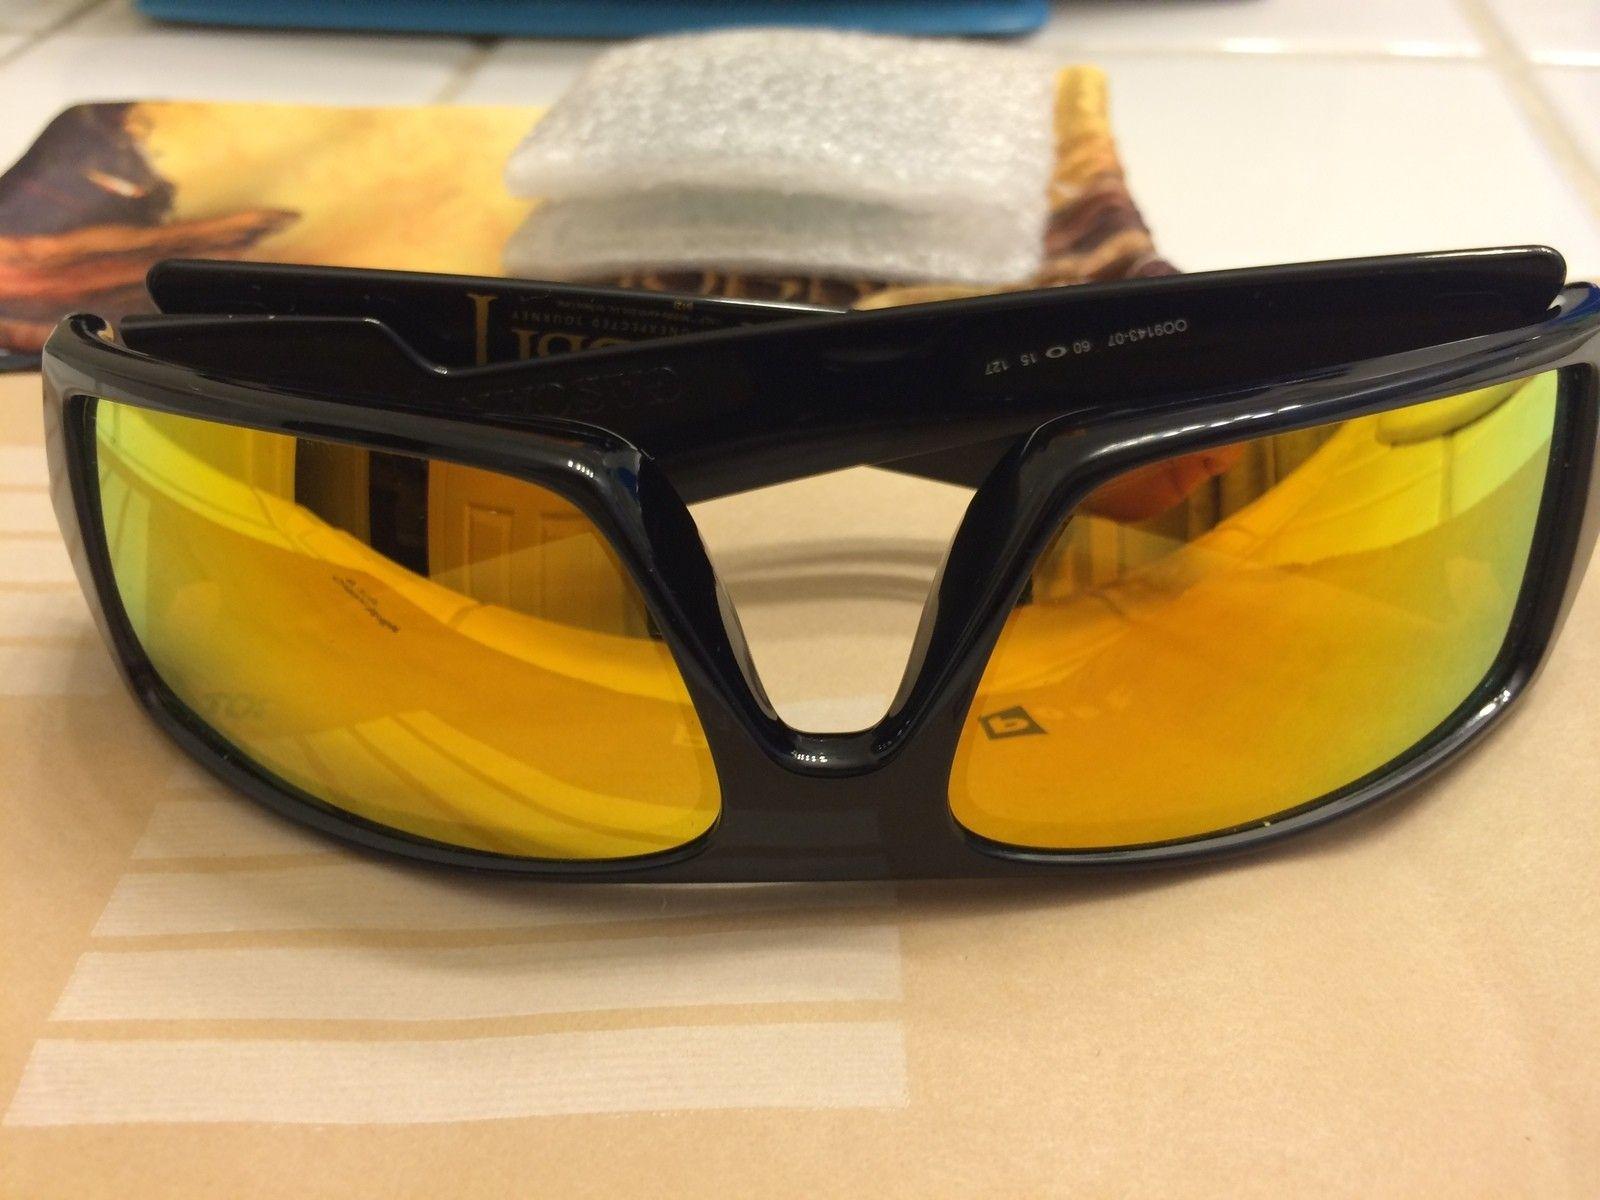 Oakley Gascan - Hobbit 3D - Xtra Lenses -under $99 - 2015-07-01 18.37.03.jpg